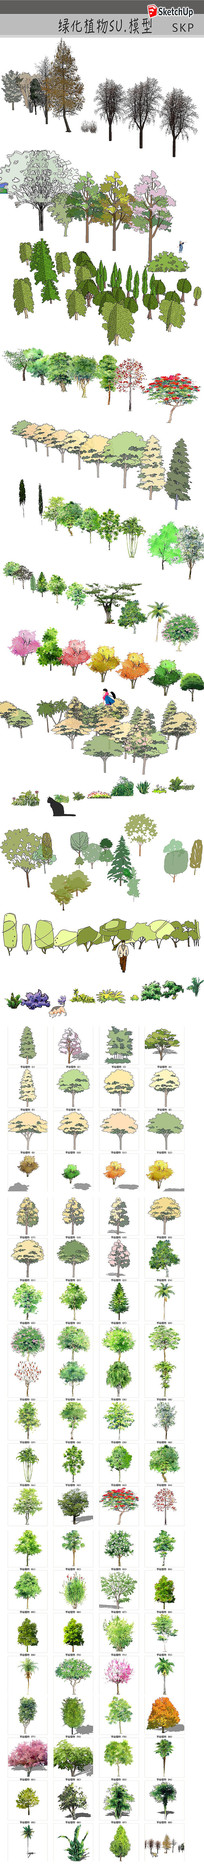 水彩树木SU模型